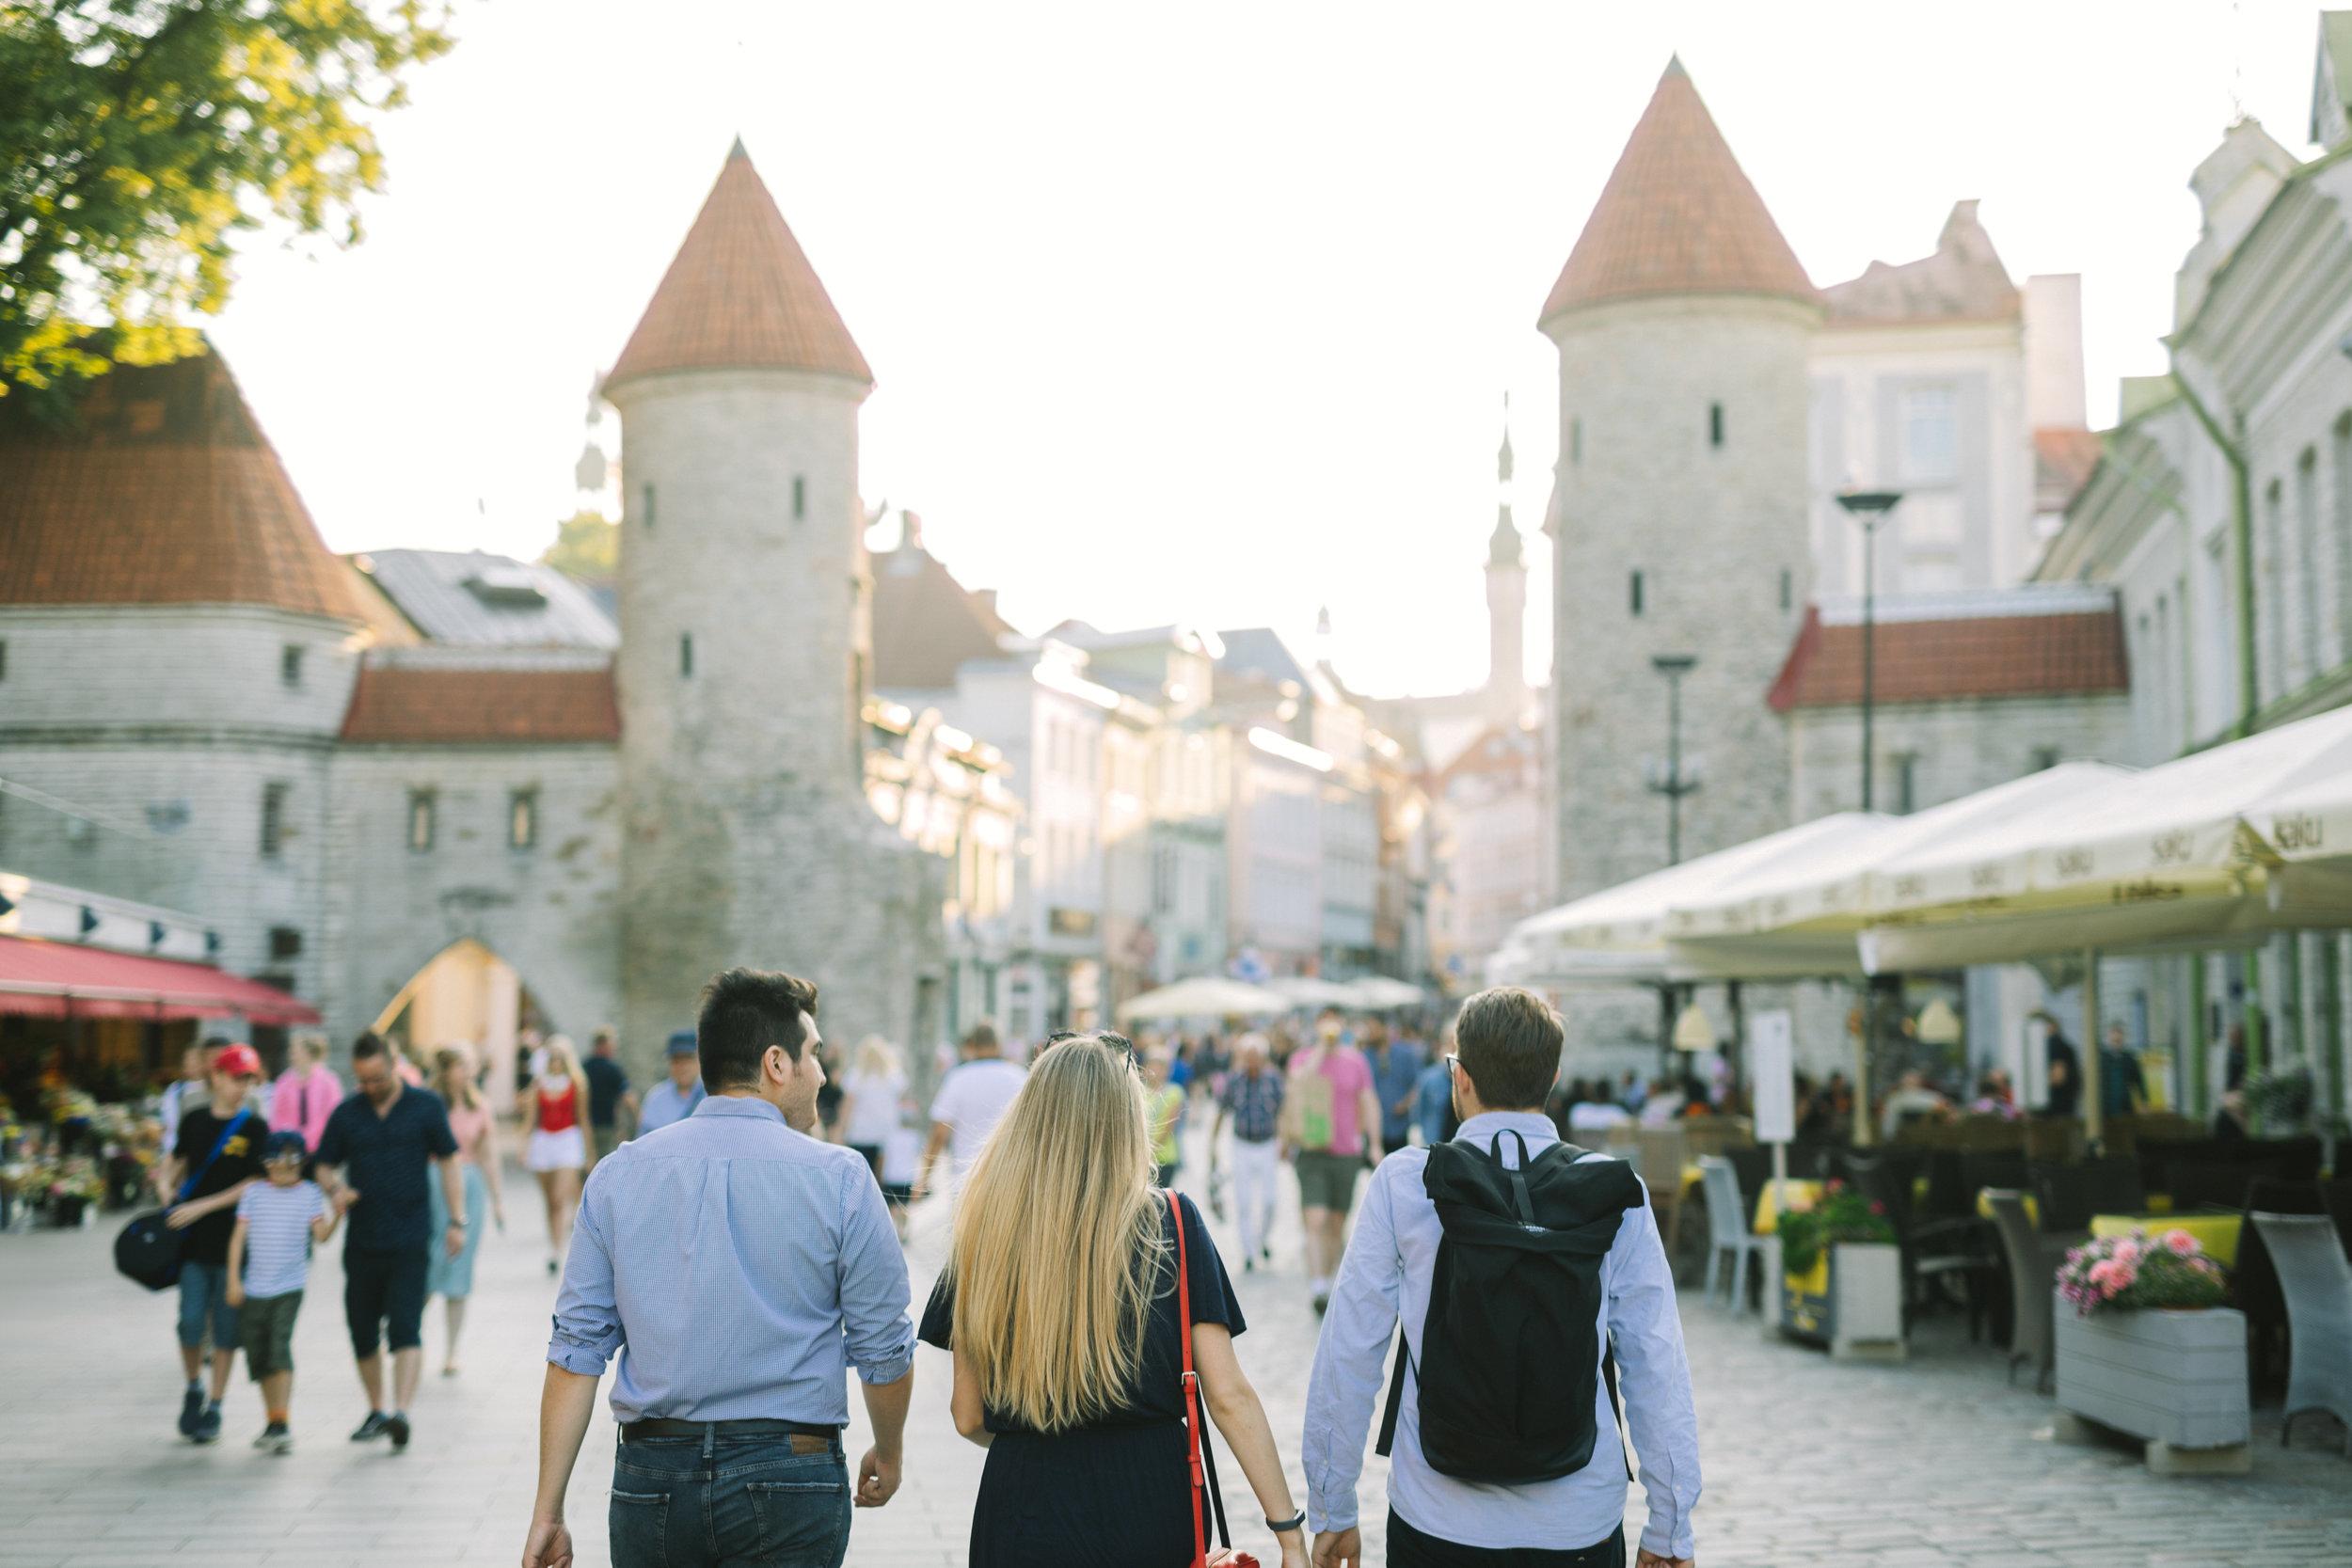 Tallinn, Estonia has the best preserved medieval old town in Europe. Photo by Rasmus Jurkatam.